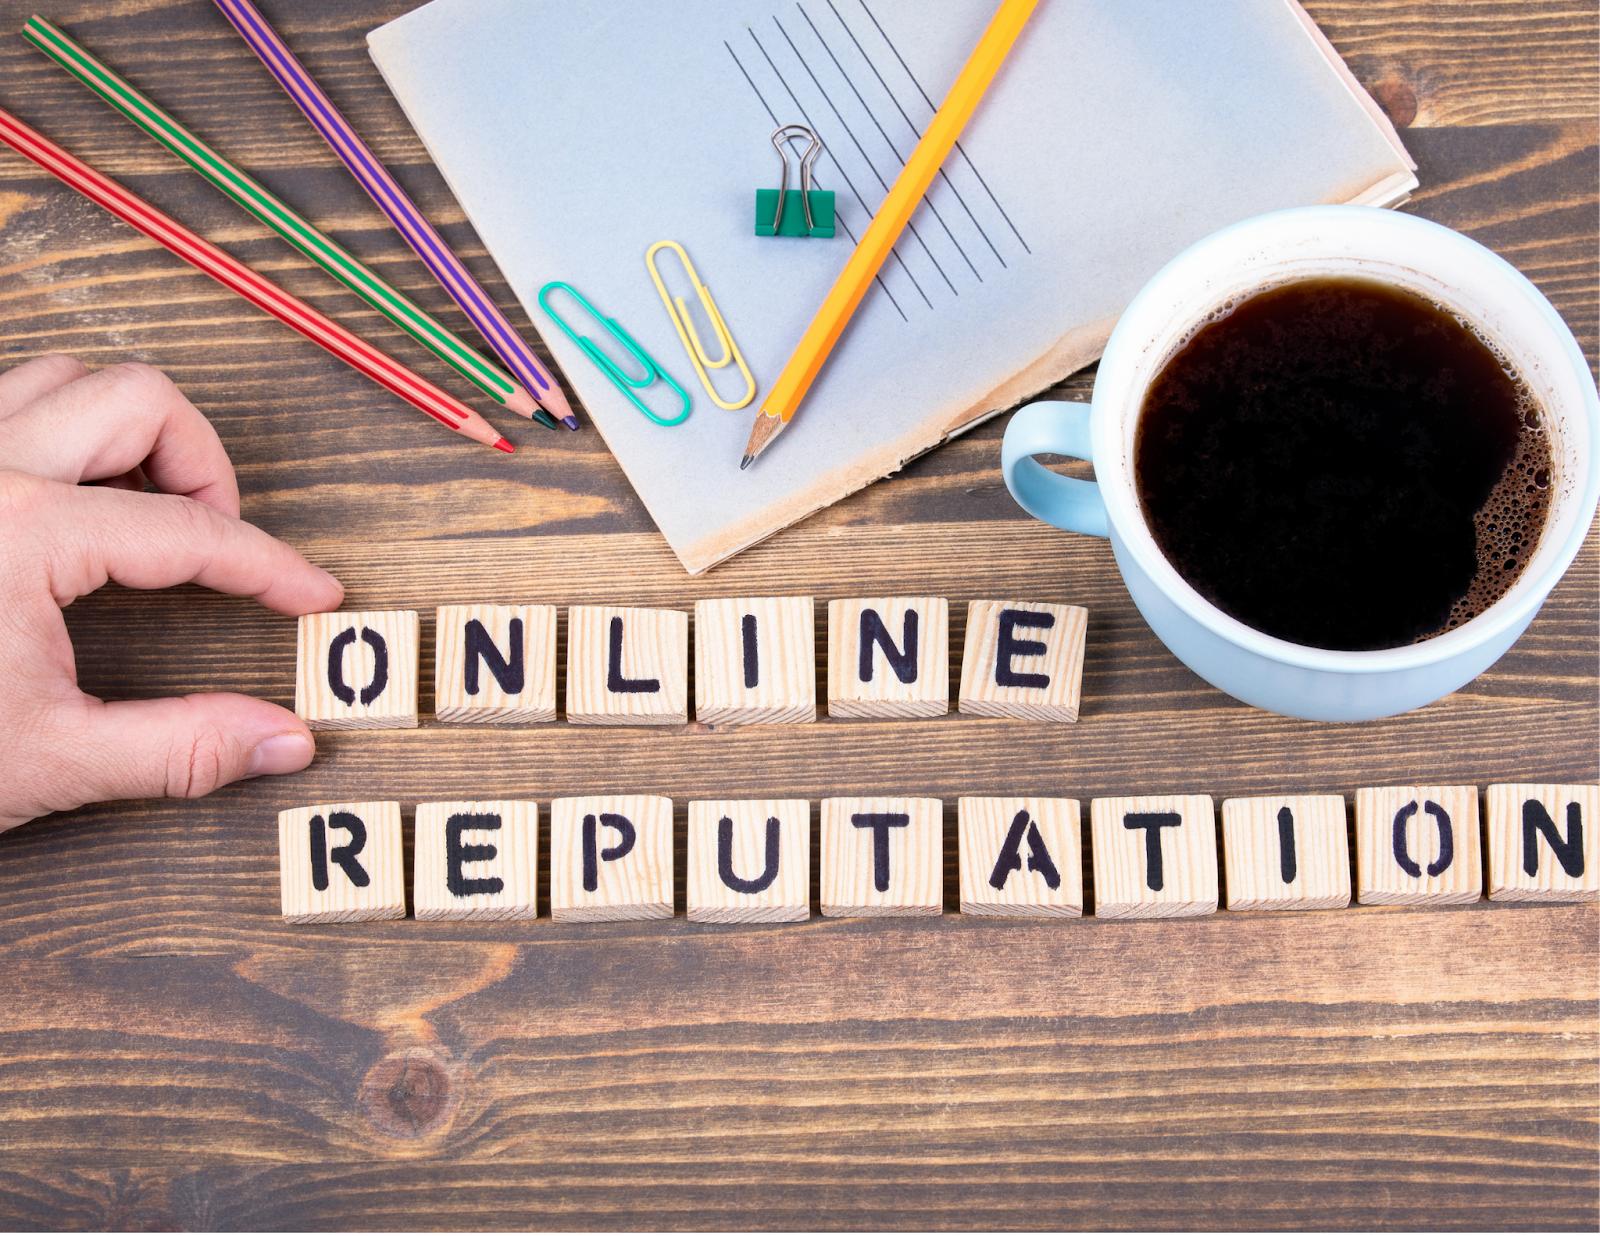 online business reputation management, how online reputation management works